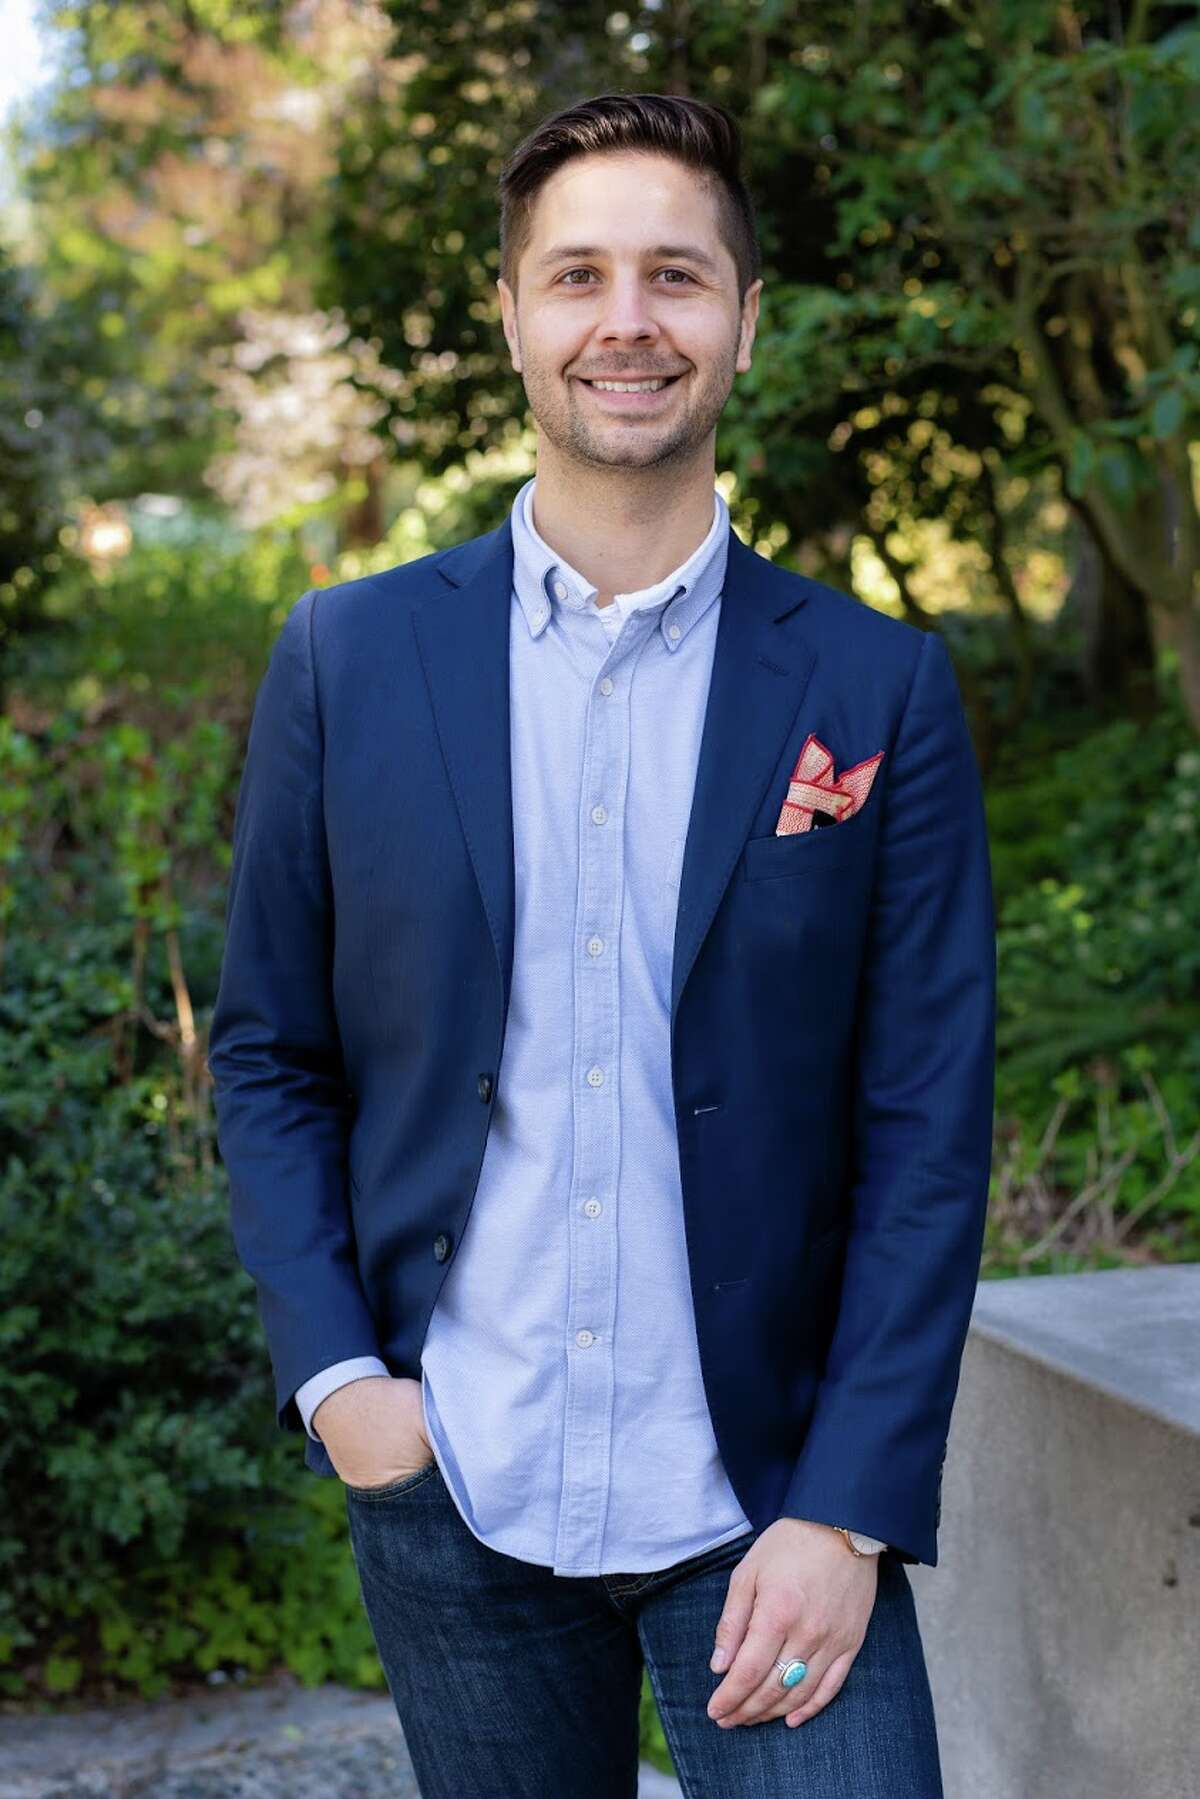 Seattle School Board Director Zachary DeWolf challenges Seattle City Council incumbent Kshama Sawant.